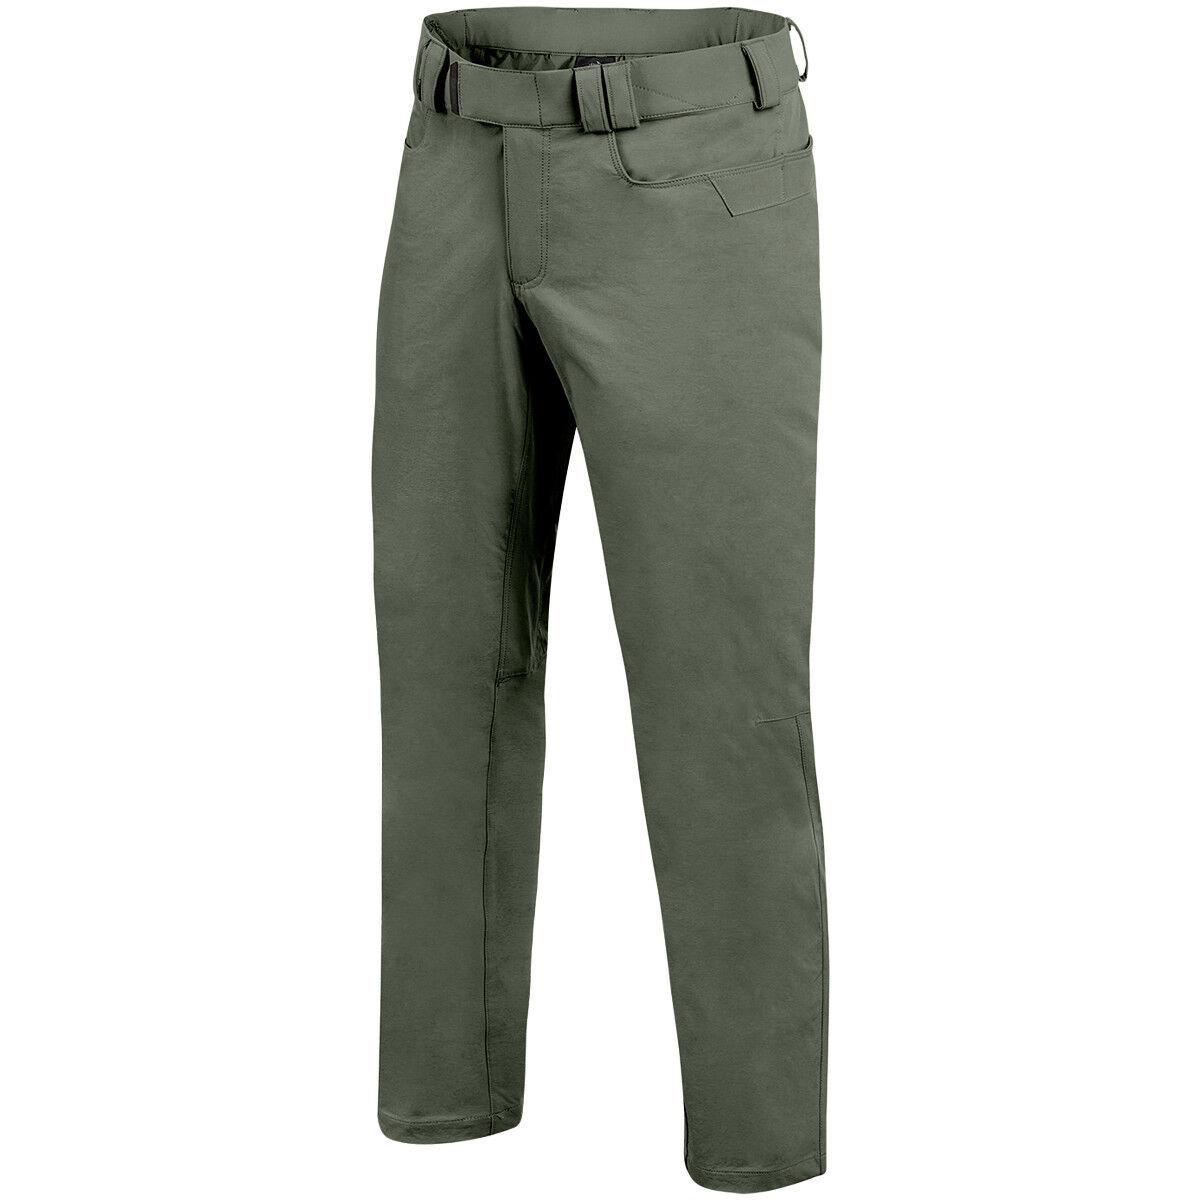 Helikon CTP Coverde Tactical Pants Uomo Pantaloni Airsoft Trekking Olive Drab